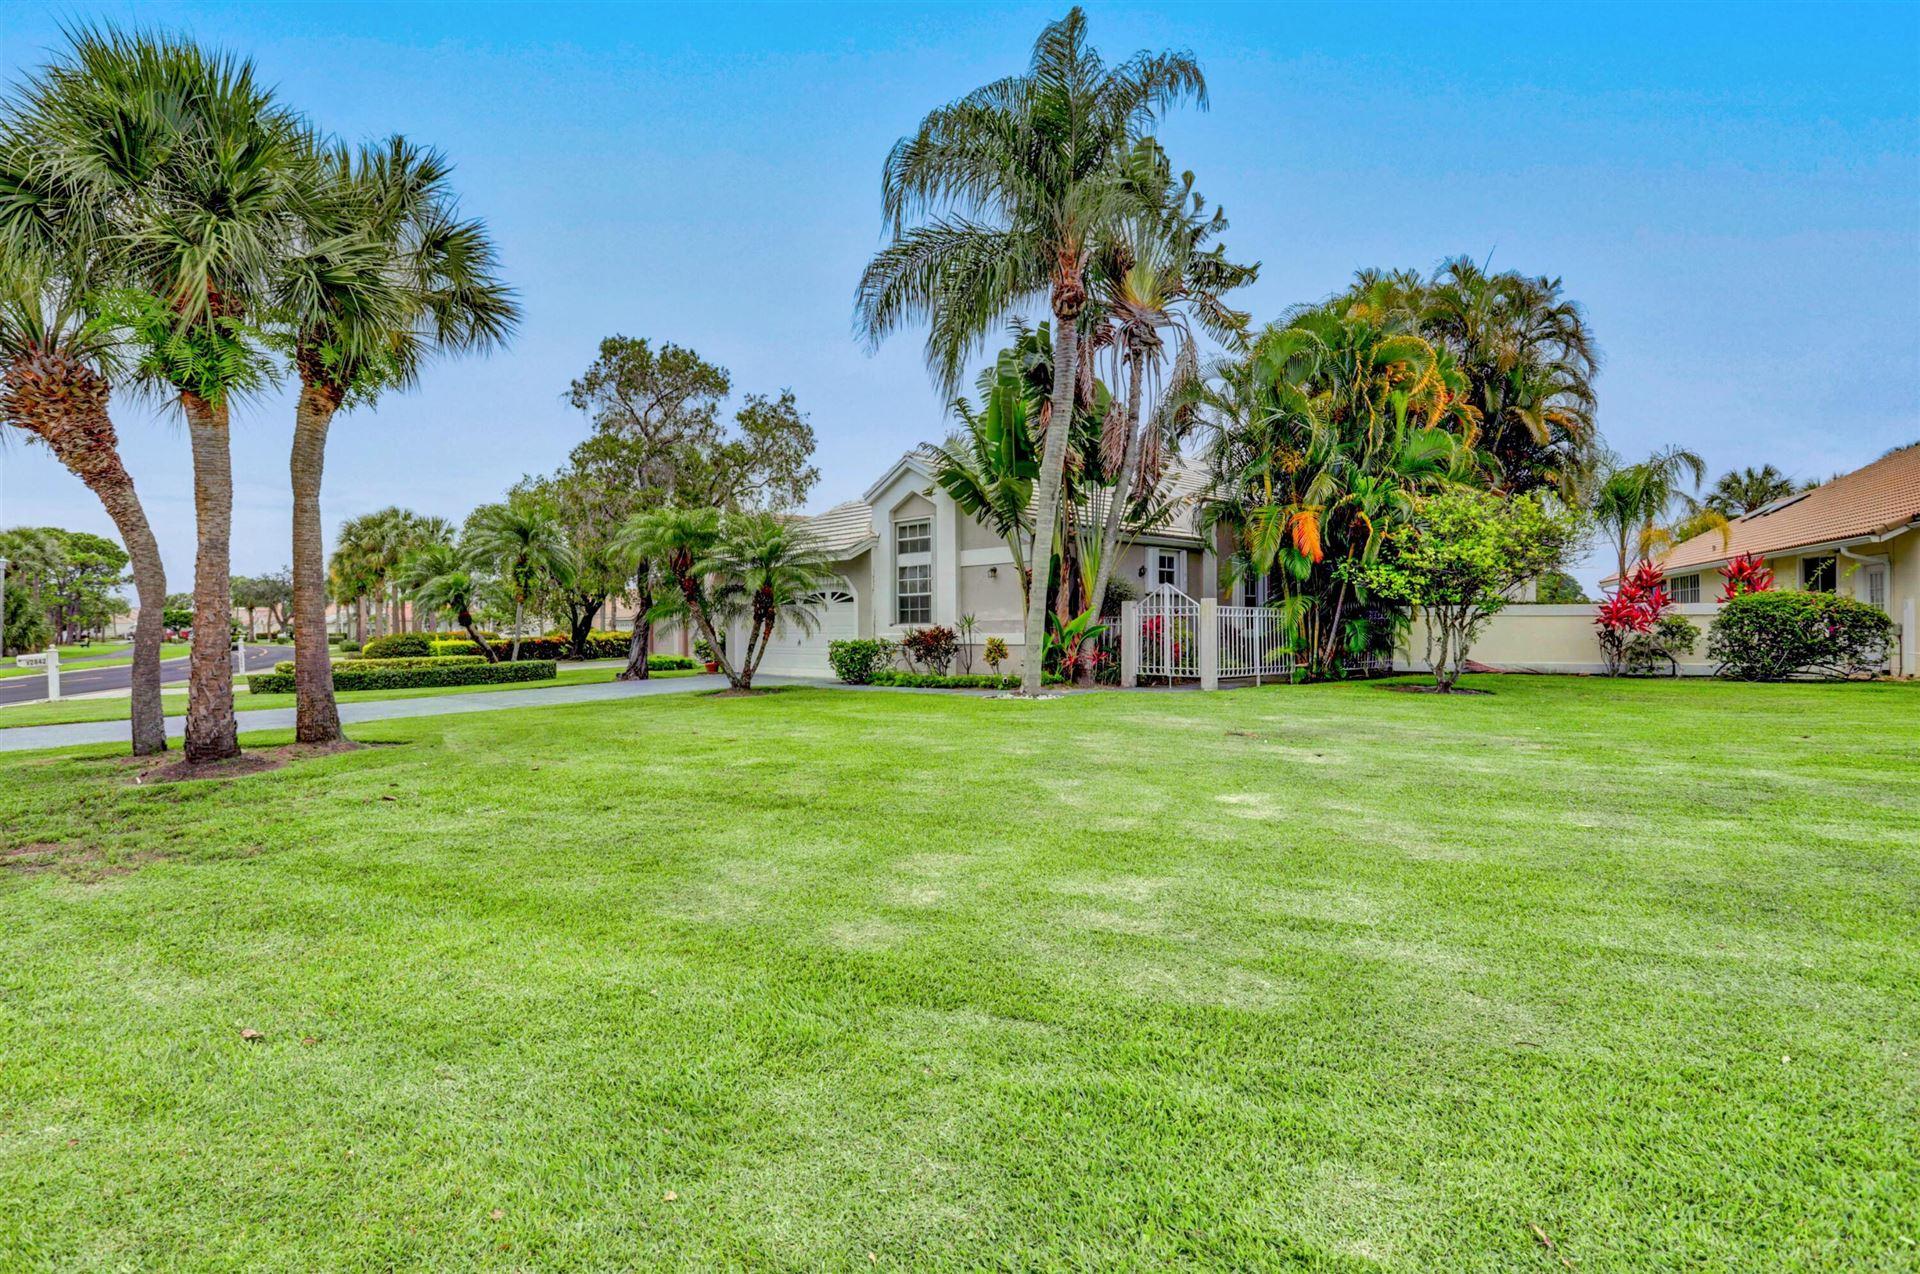 Photo of 12836 Touchstone Place, Palm Beach Gardens, FL 33418 (MLS # RX-10727516)